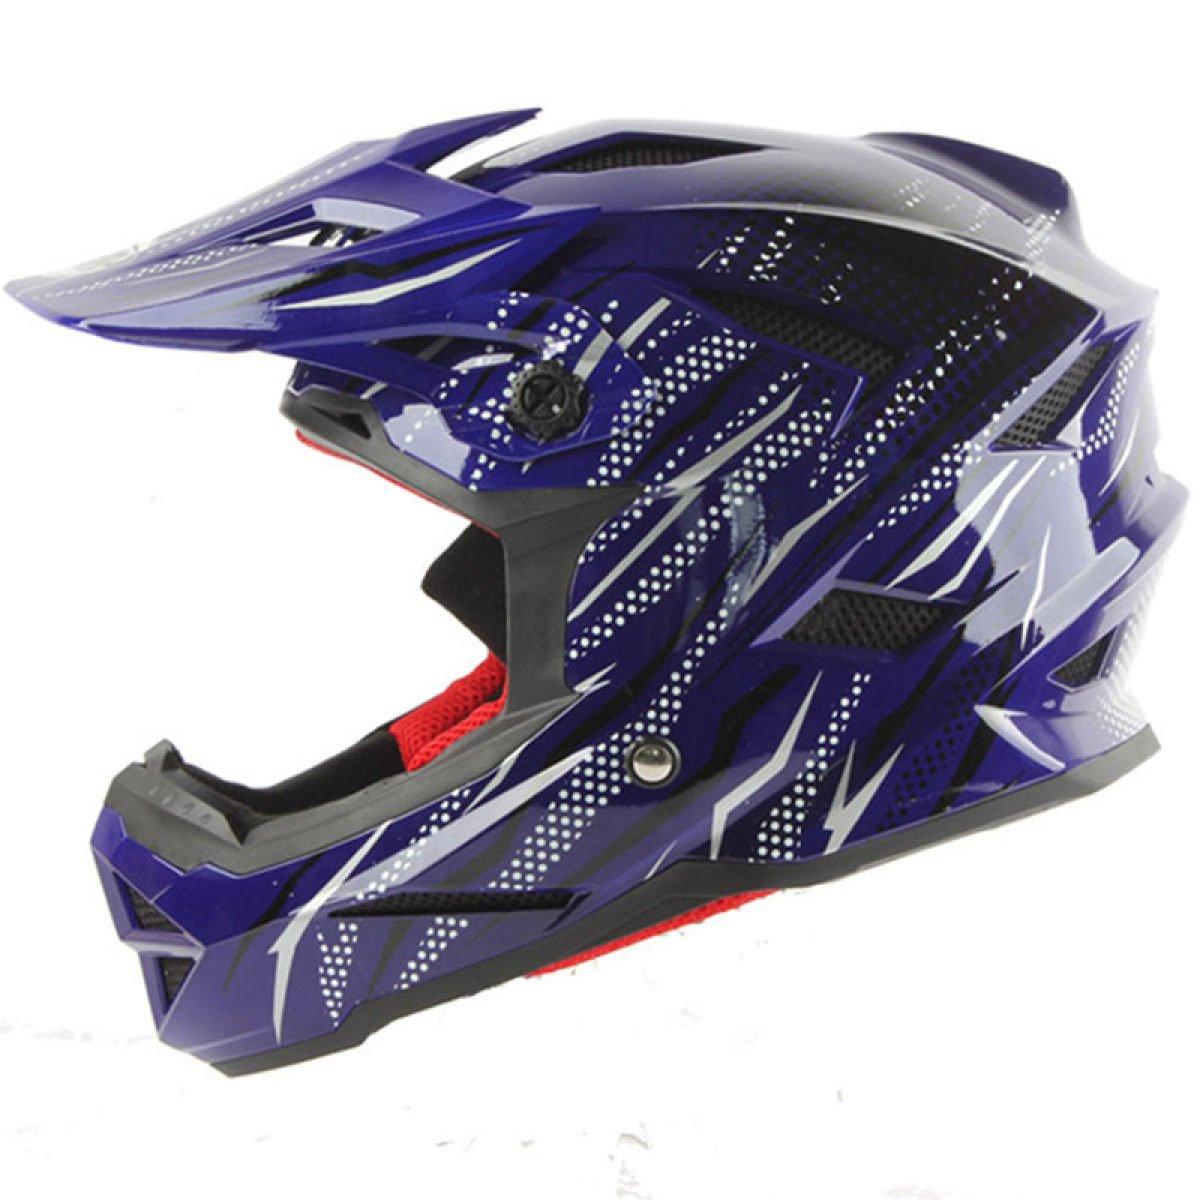 TZQ Full Helm Helm Winterhelm Anti-Glare Verlangsamung Drop Hat Herren Sonnenschutzhelme Helme